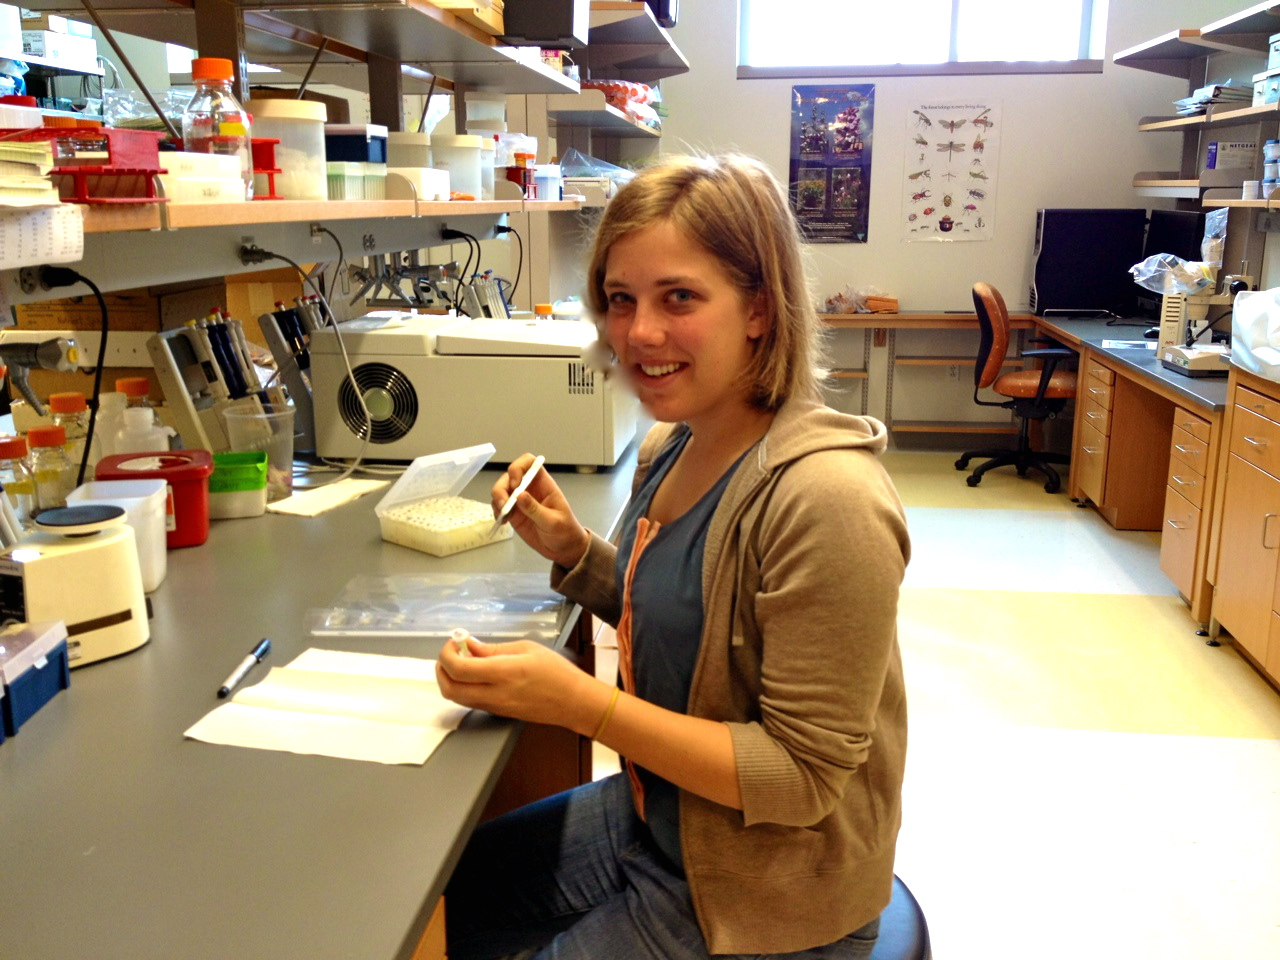 Sarah Heyborne preparing to measure crickets.